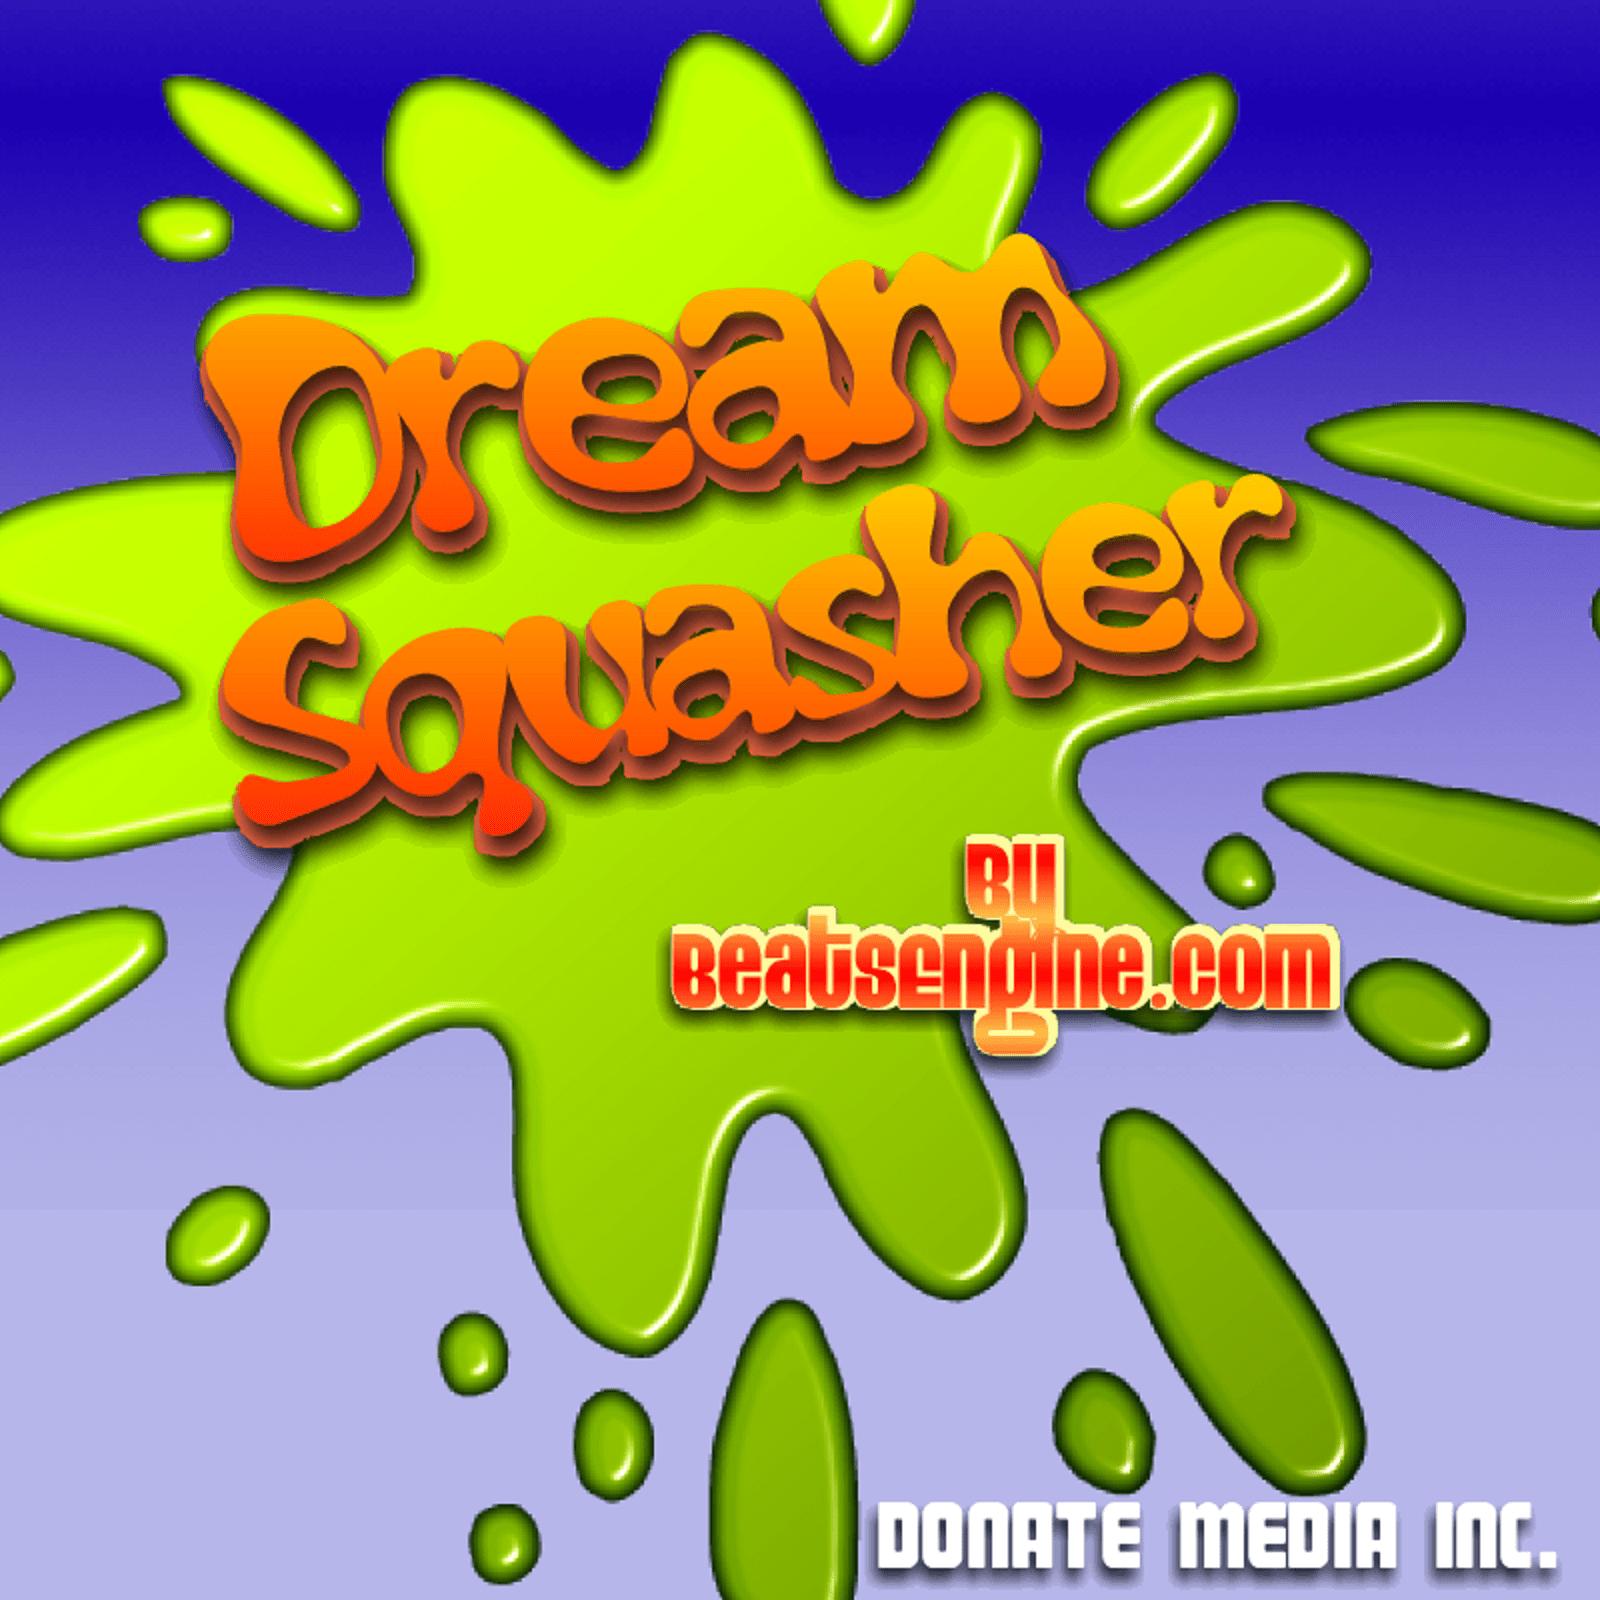 Dream Squasher Cover